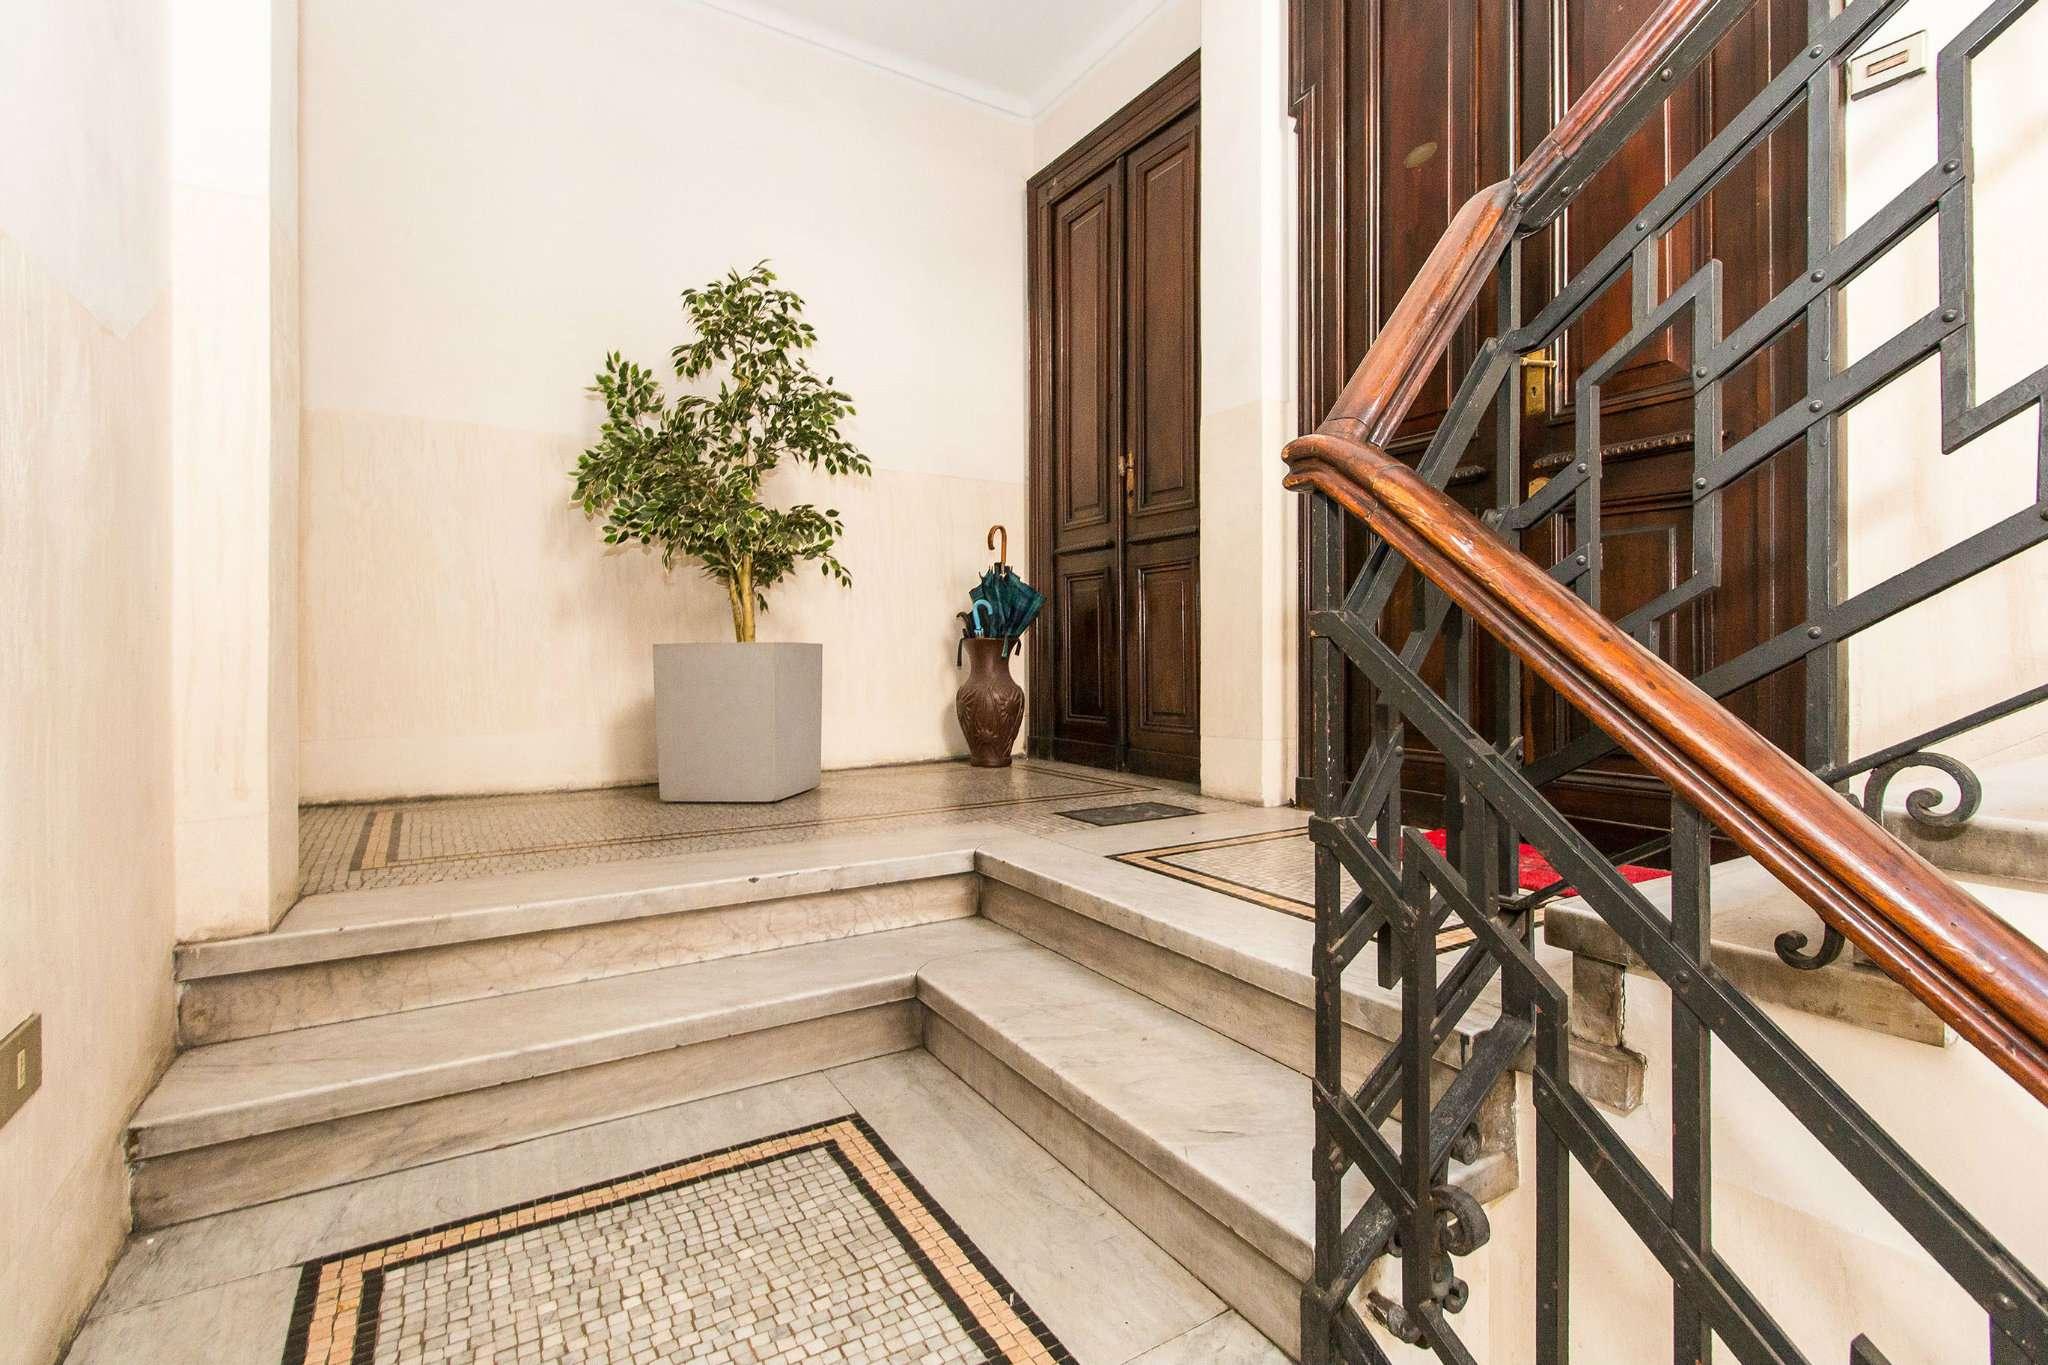 Torino Torino Vendita APPARTAMENTO » alloggi vendita, appartamenti a torino